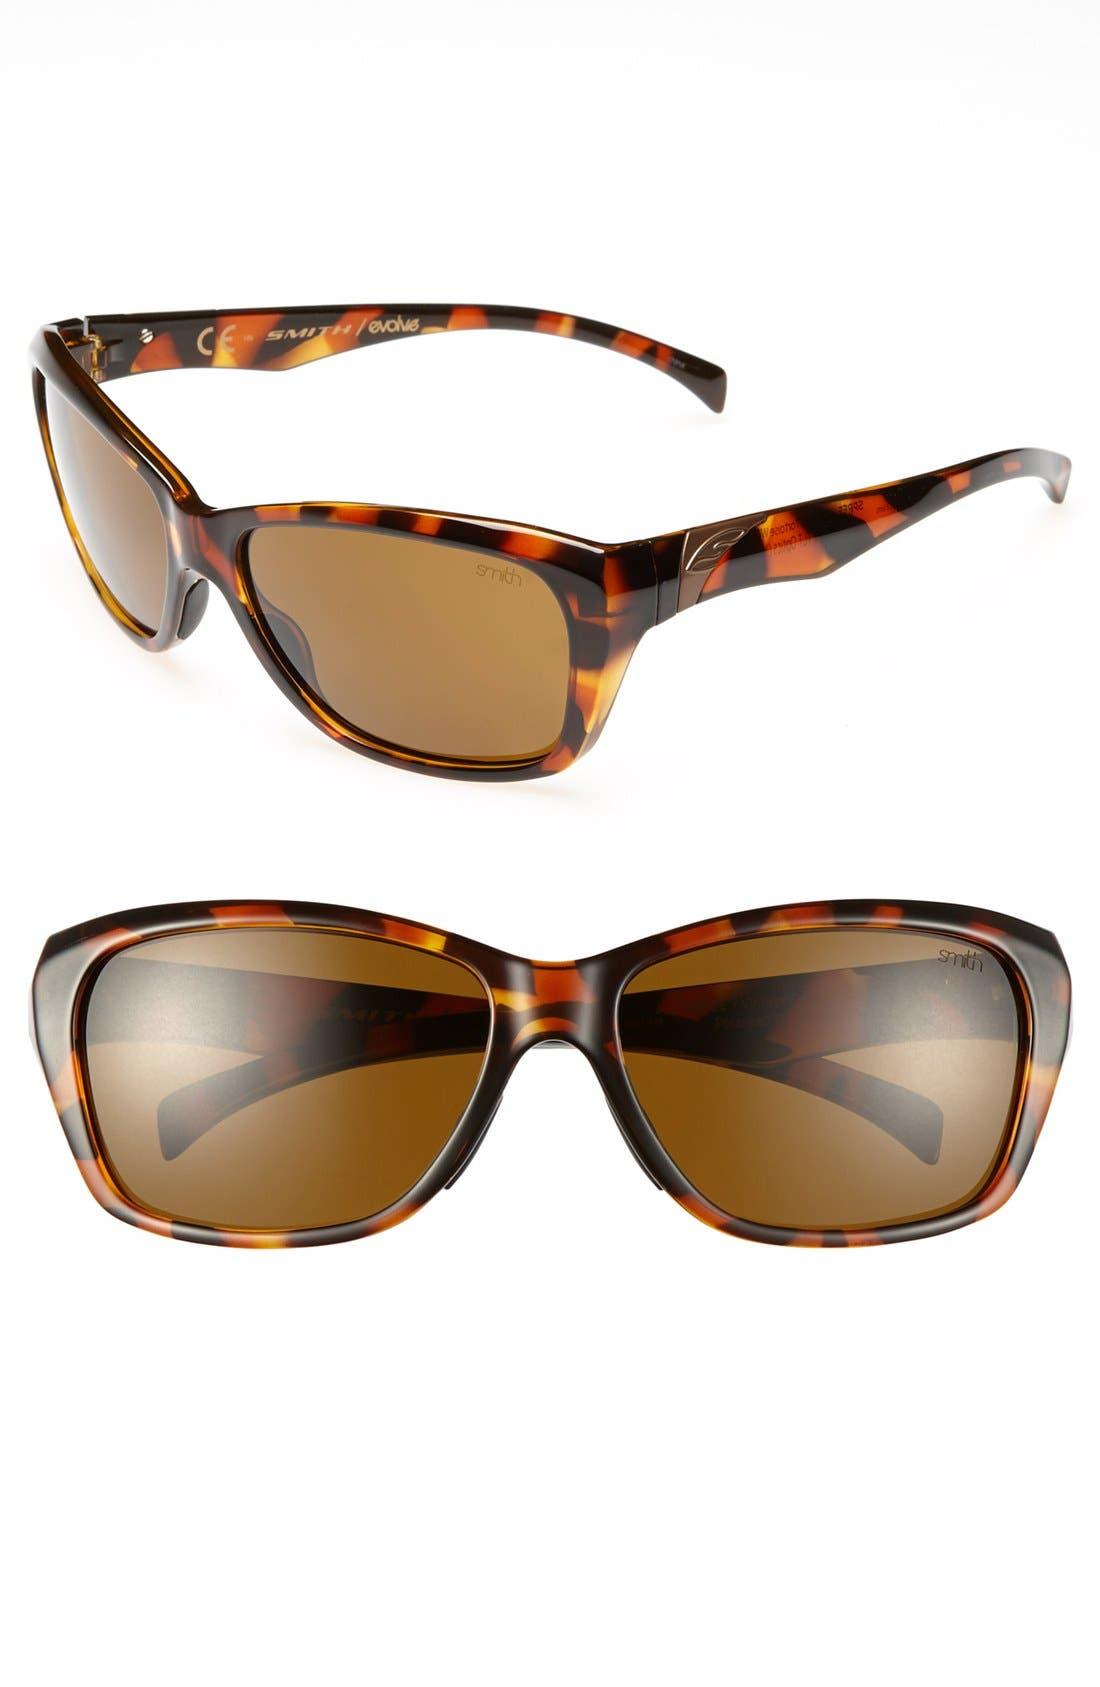 Alternate Image 1 Selected - Smith 'Spree' 58mm Polarized Sunglasses